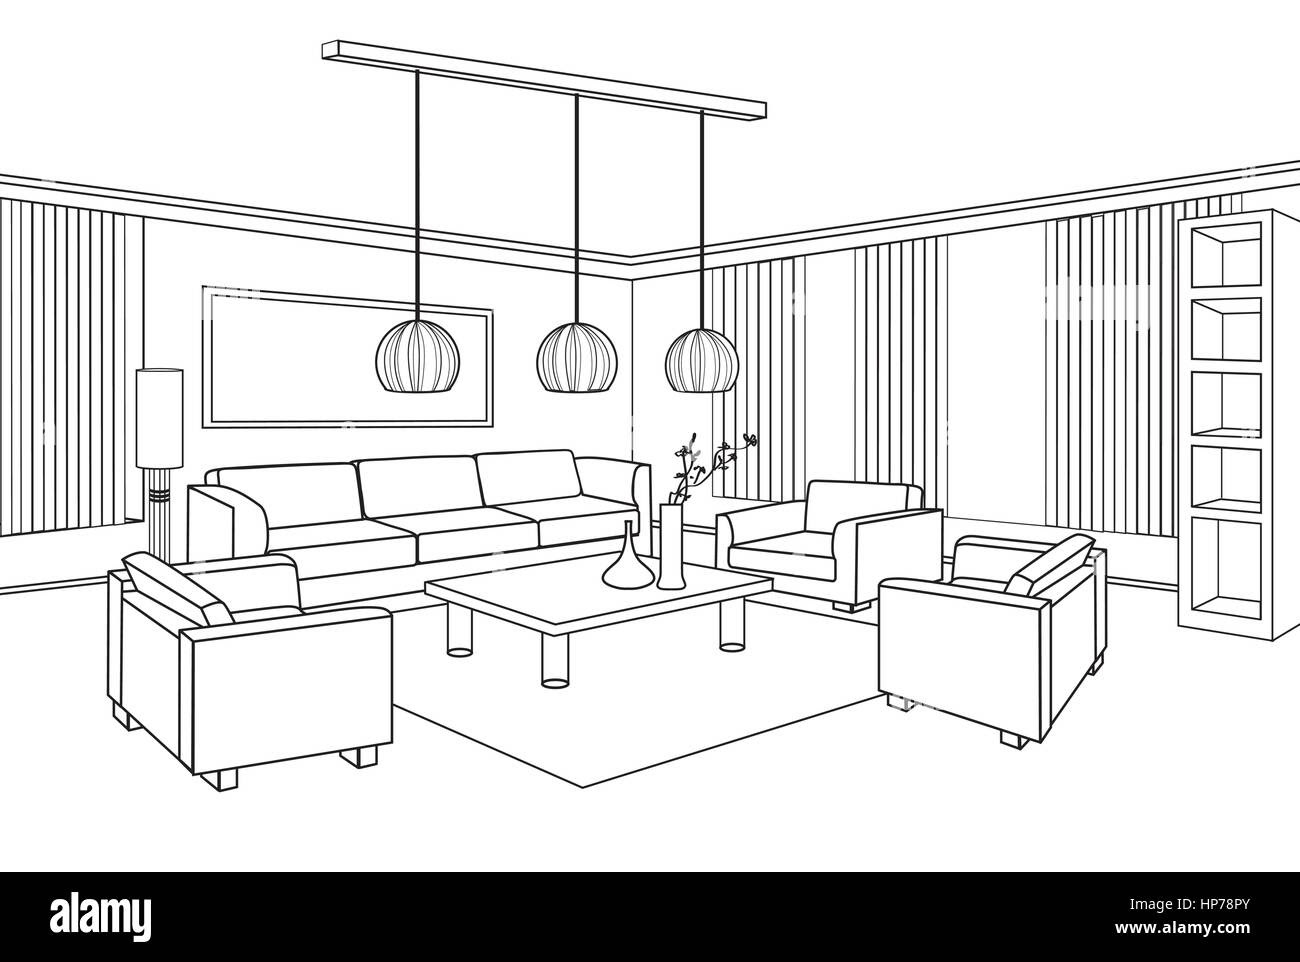 Living room view. Interior outline sketch. Furniture ...